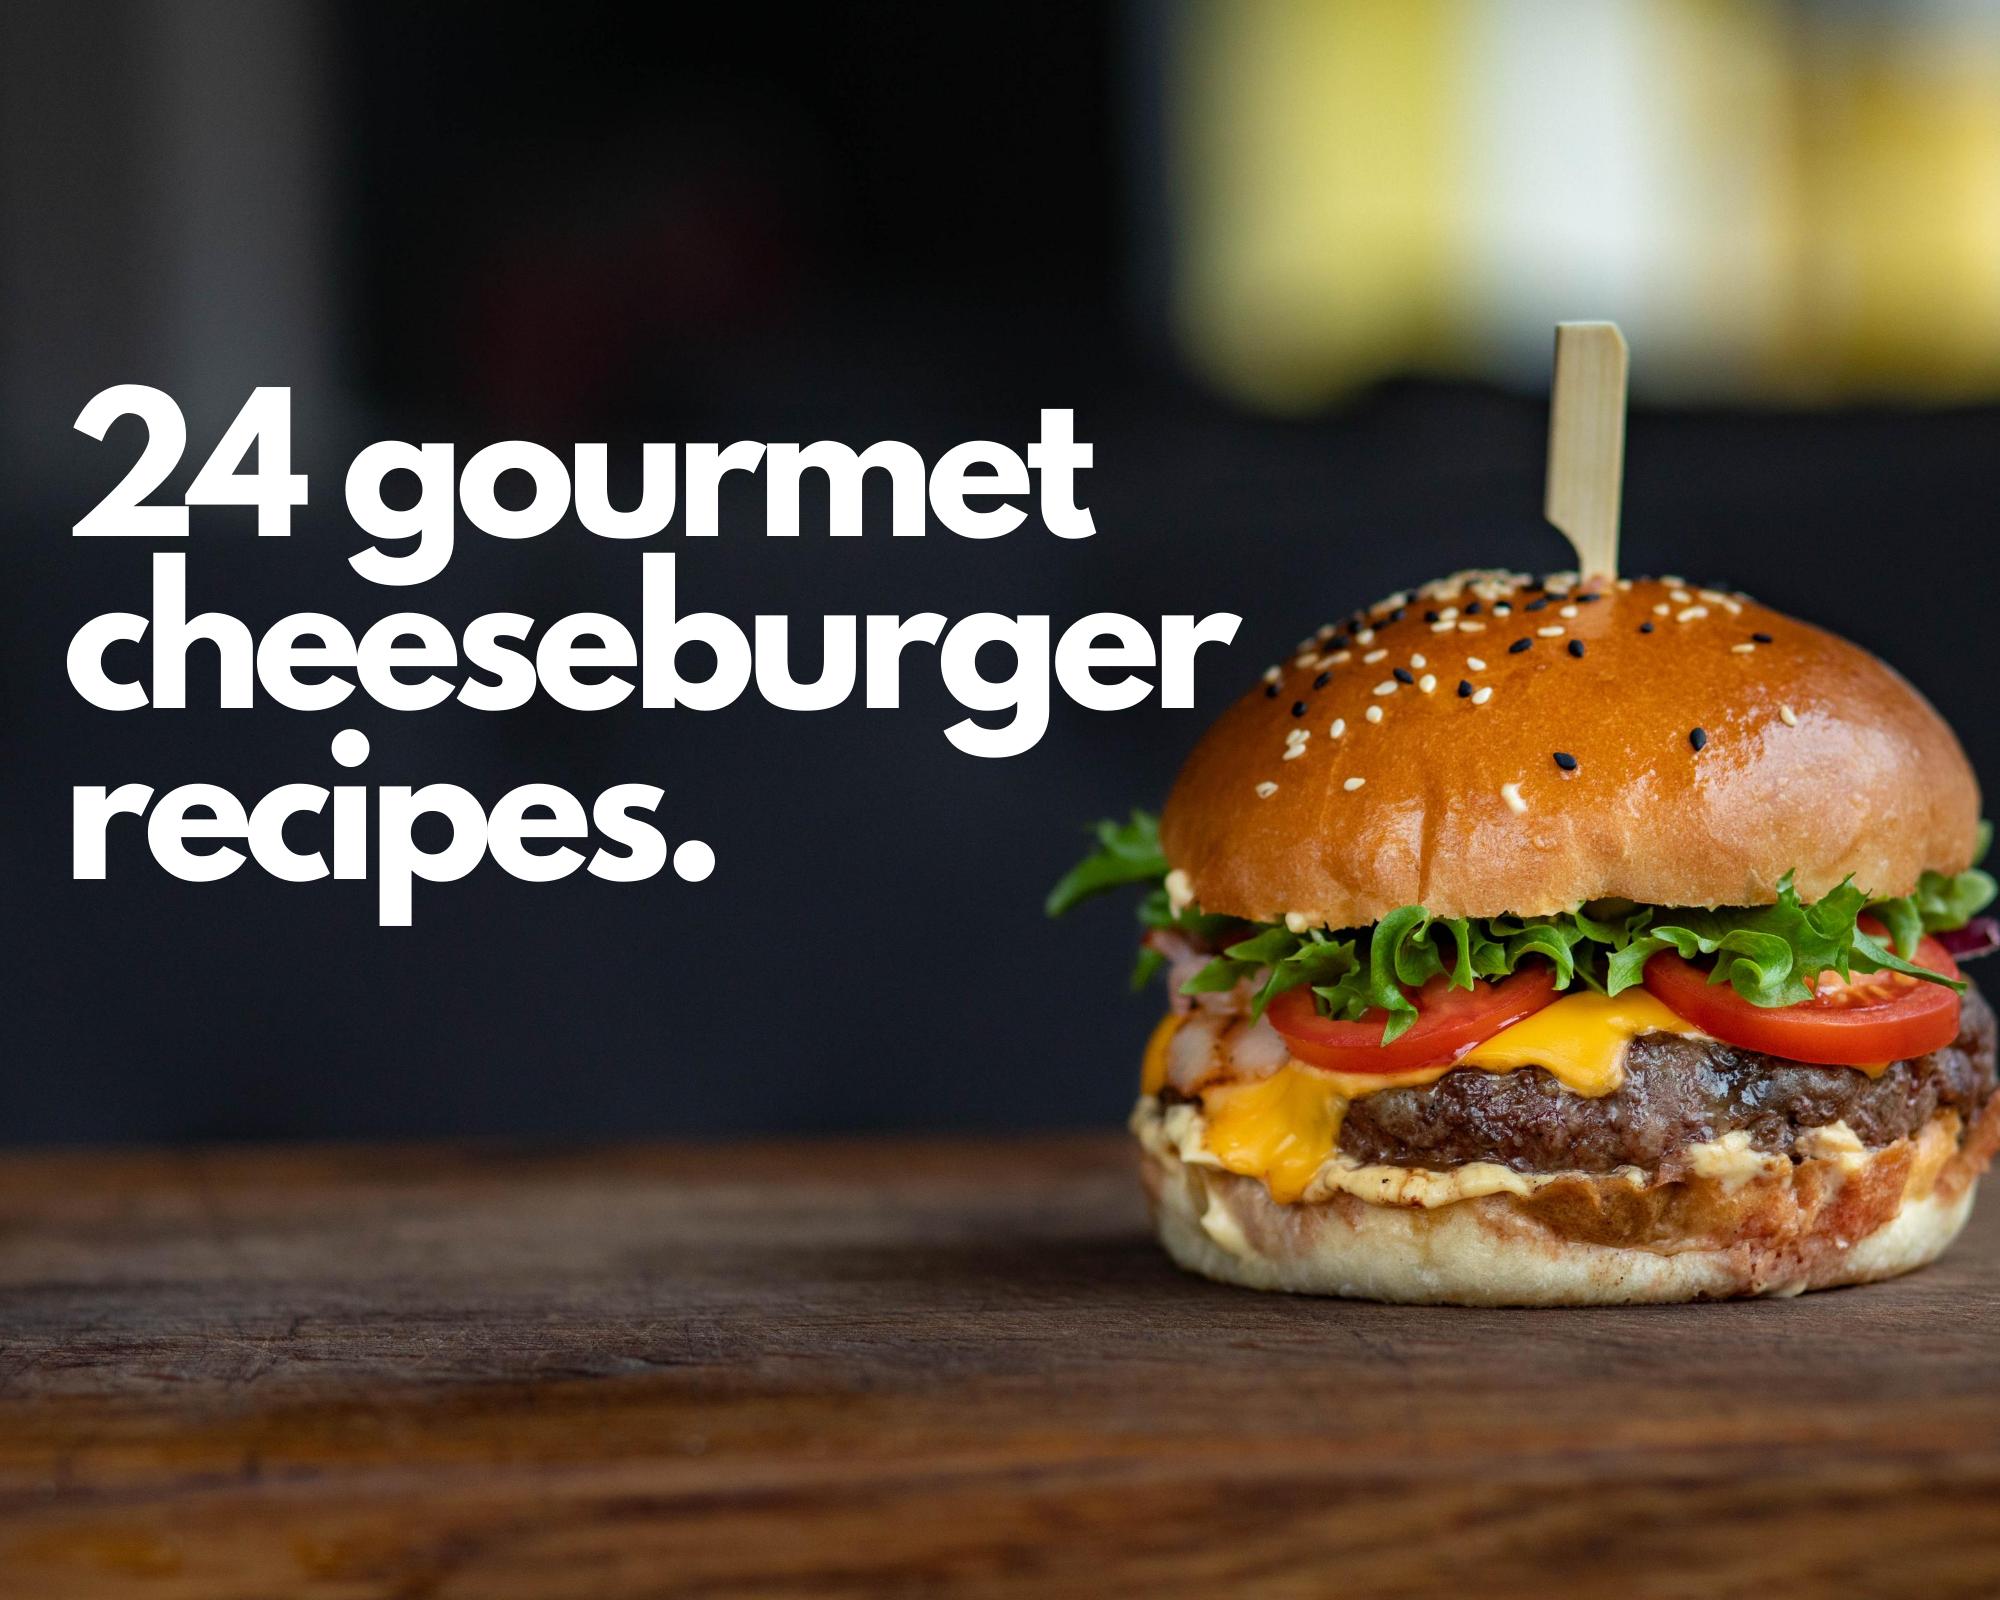 Gourmet cheeseburger on a table